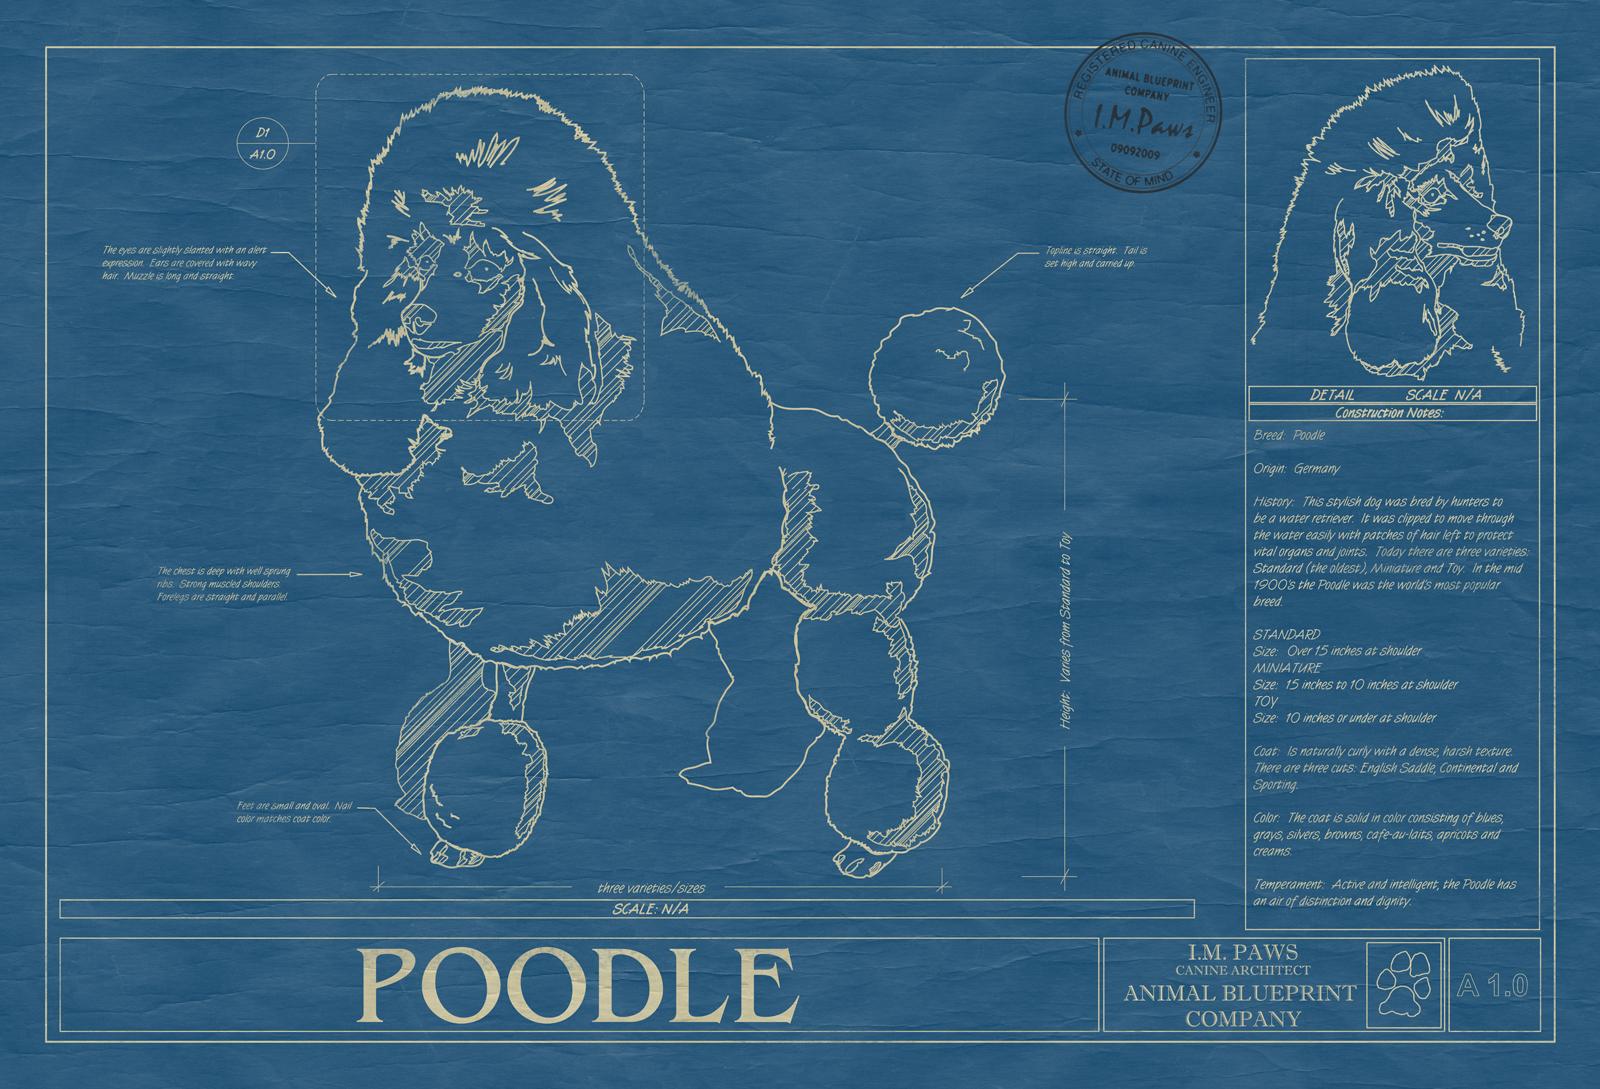 Poodle animal blueprint company poodle dog blueprint malvernweather Gallery